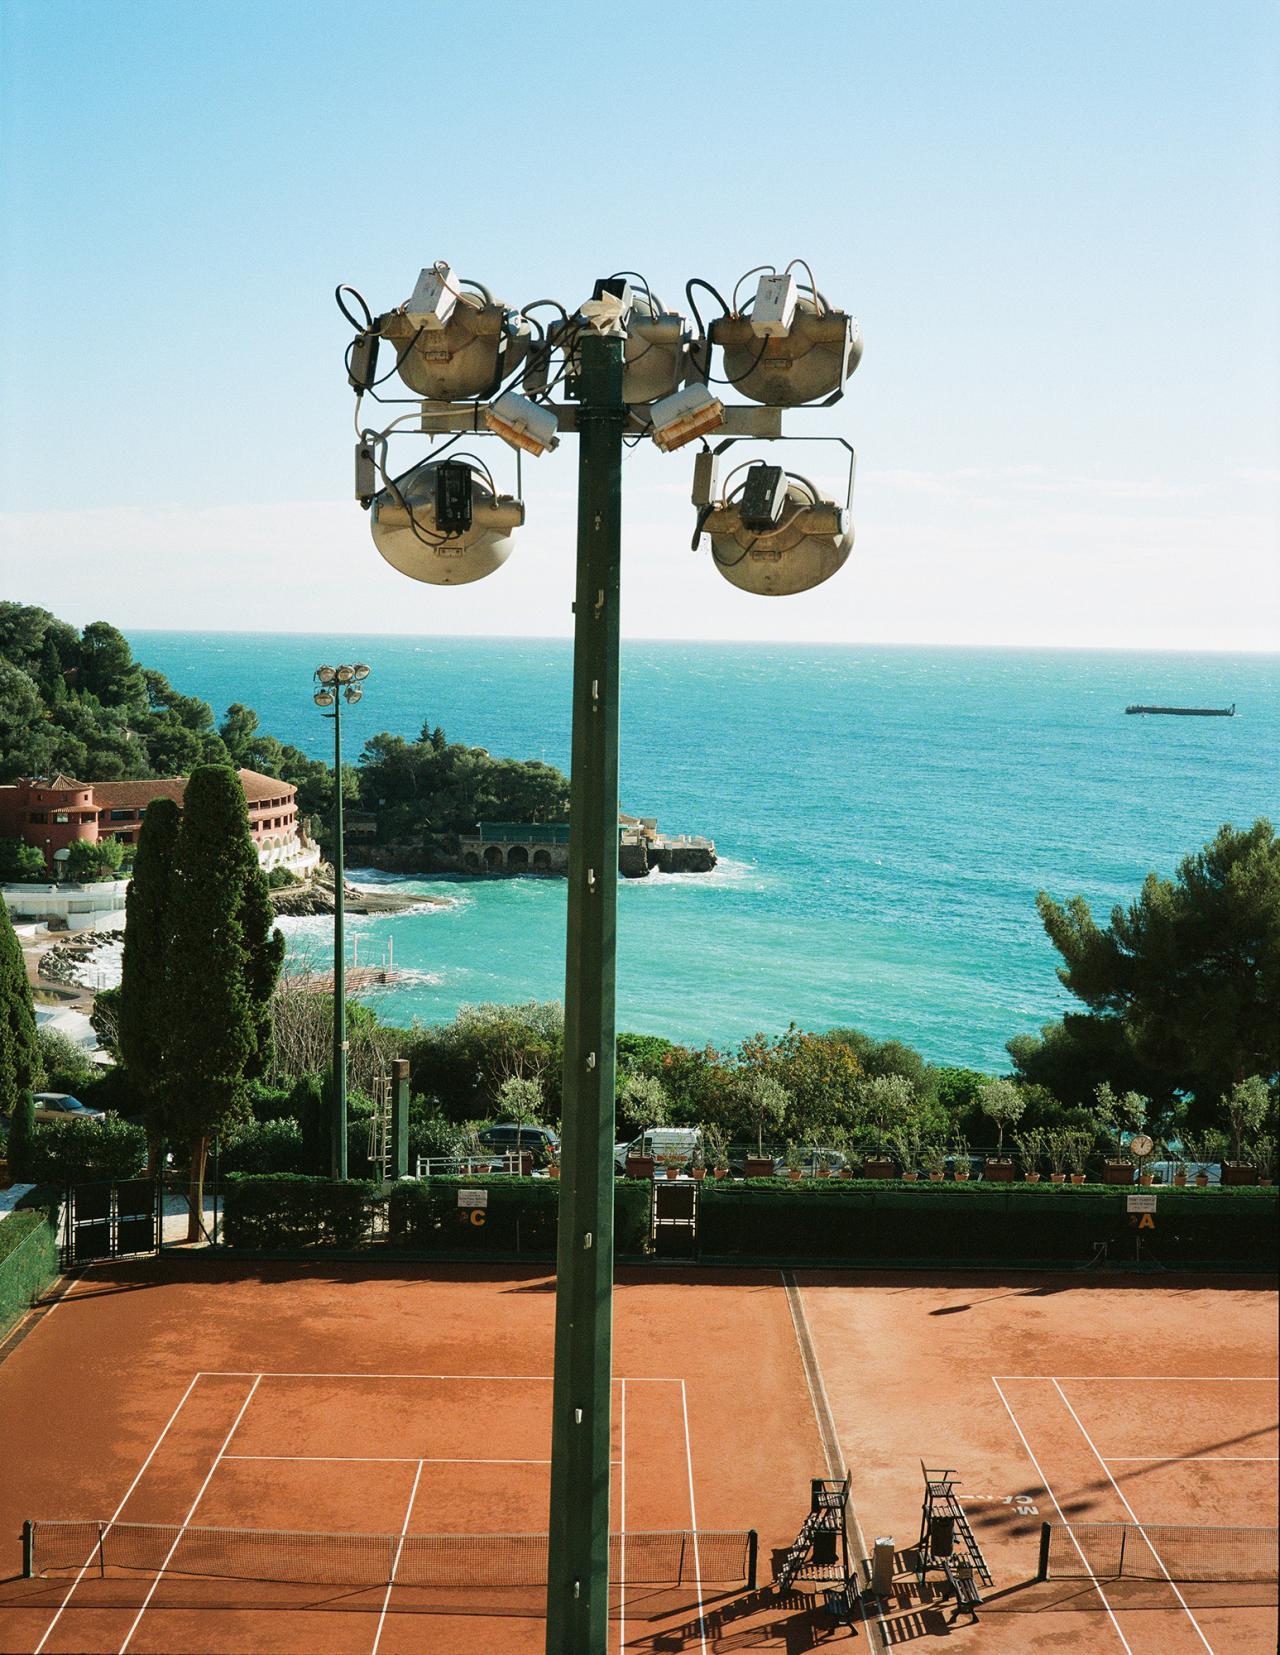 Monte Carlo Country Club, Monaco, 2019